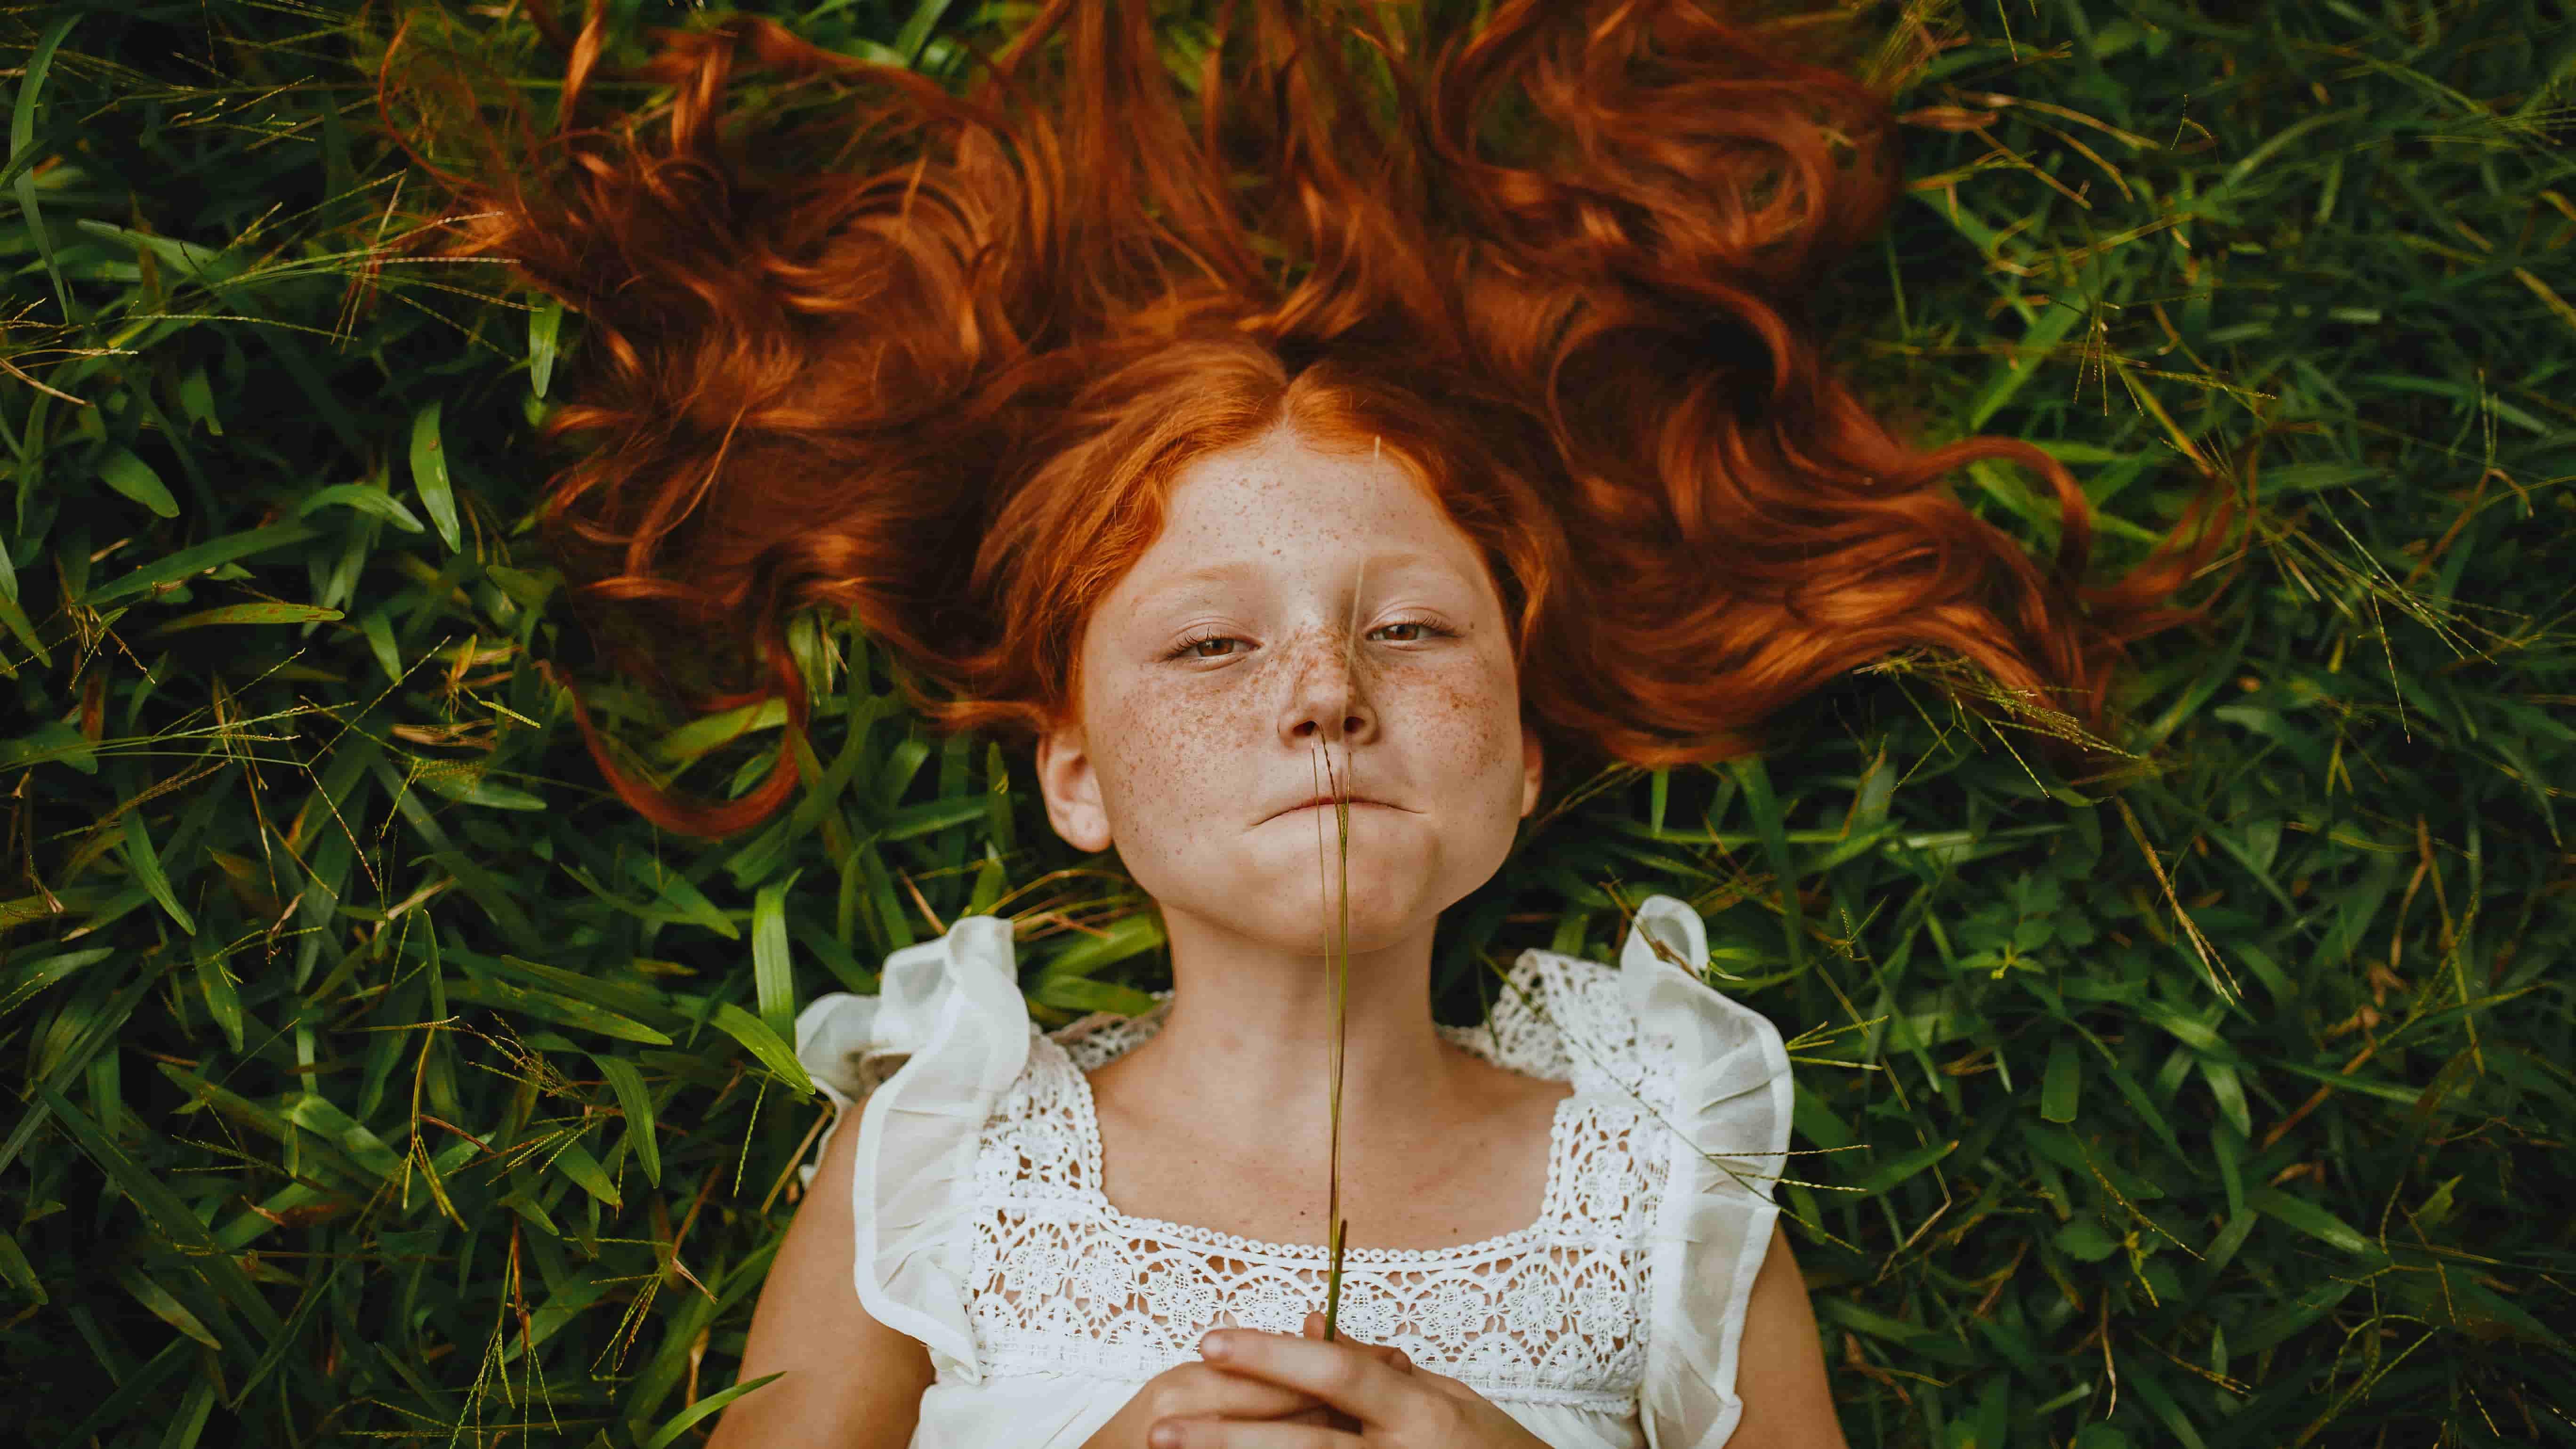 Innocence and Childhood